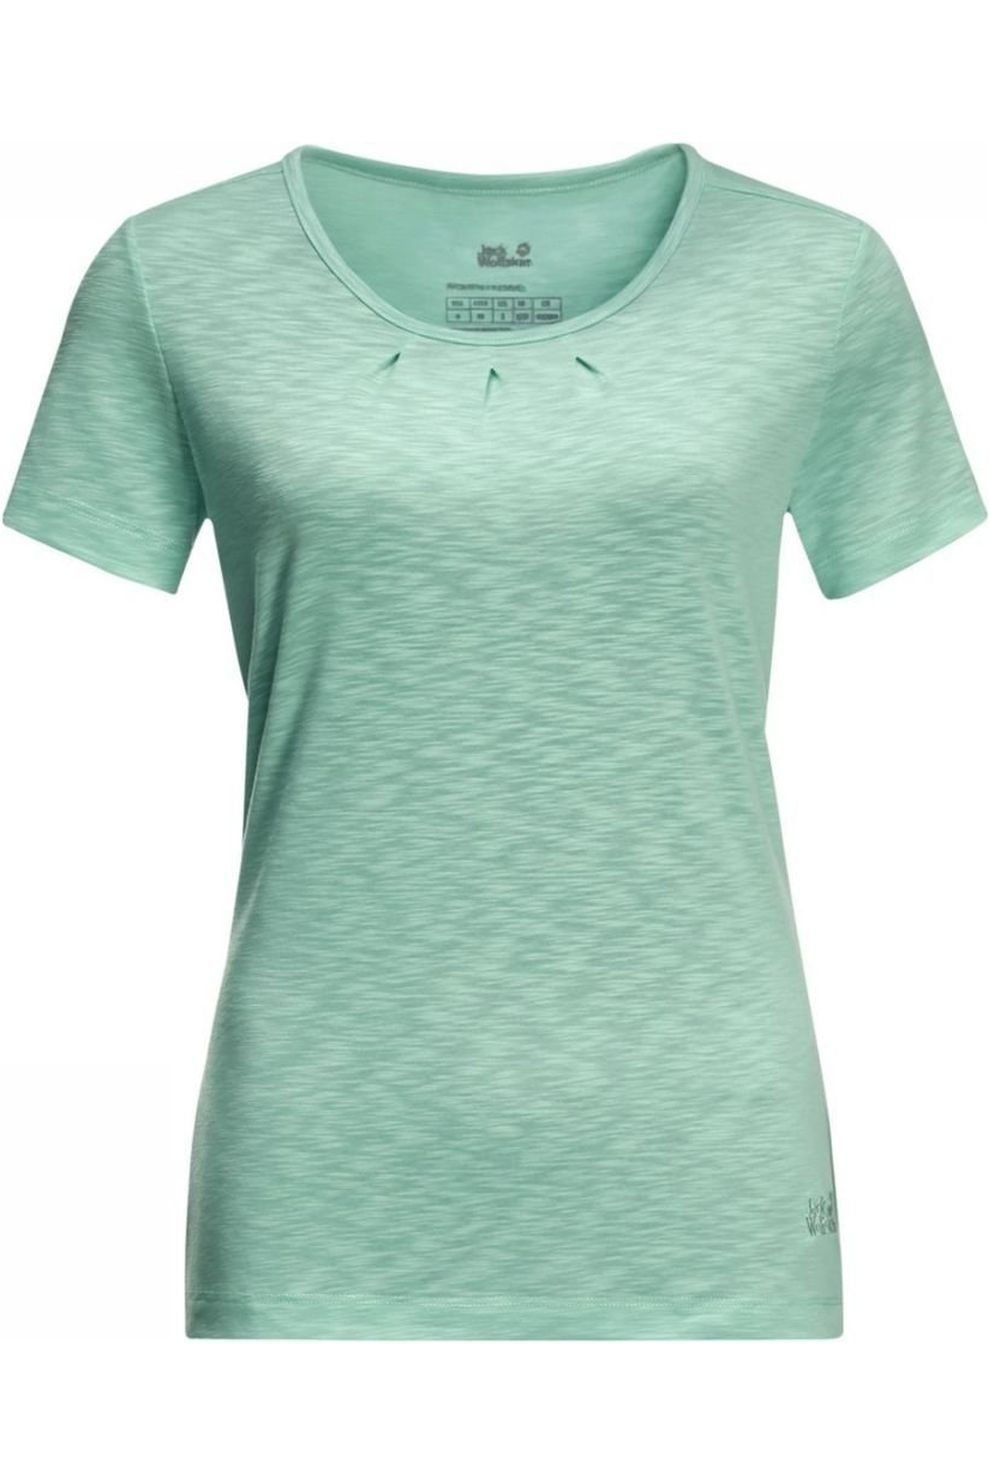 Jack Wolfskin T-Shirt Travel Drape T voor dames - Blauw - Maten: XS, S, M, L, XL, XXL